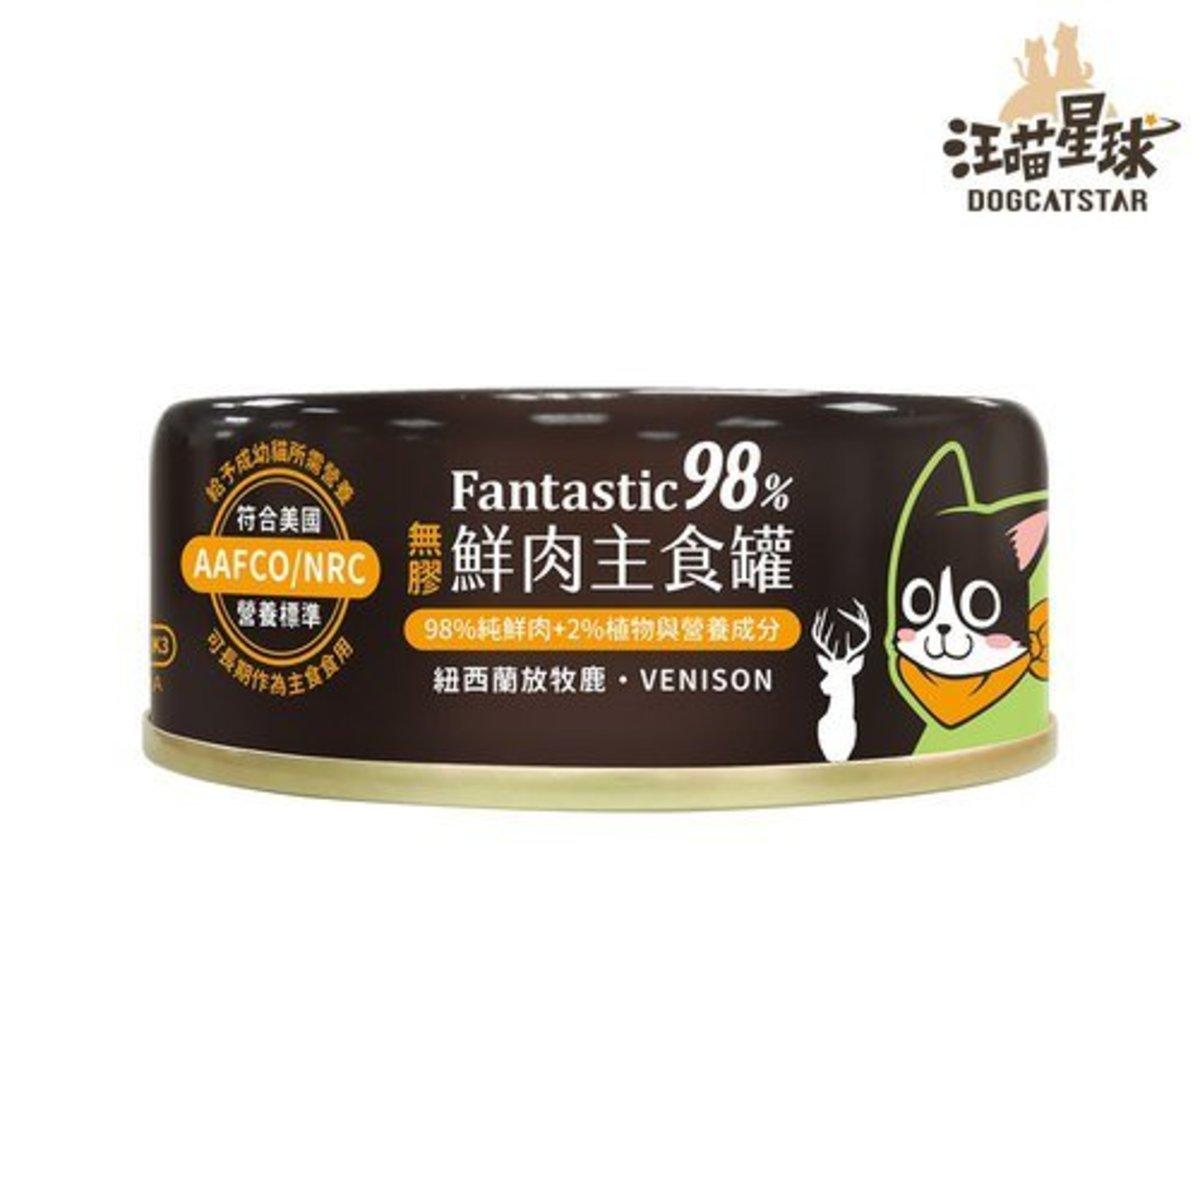 98% Fantastic 鮮肉主食罐 - 鹿肉 80g(三罐裝)